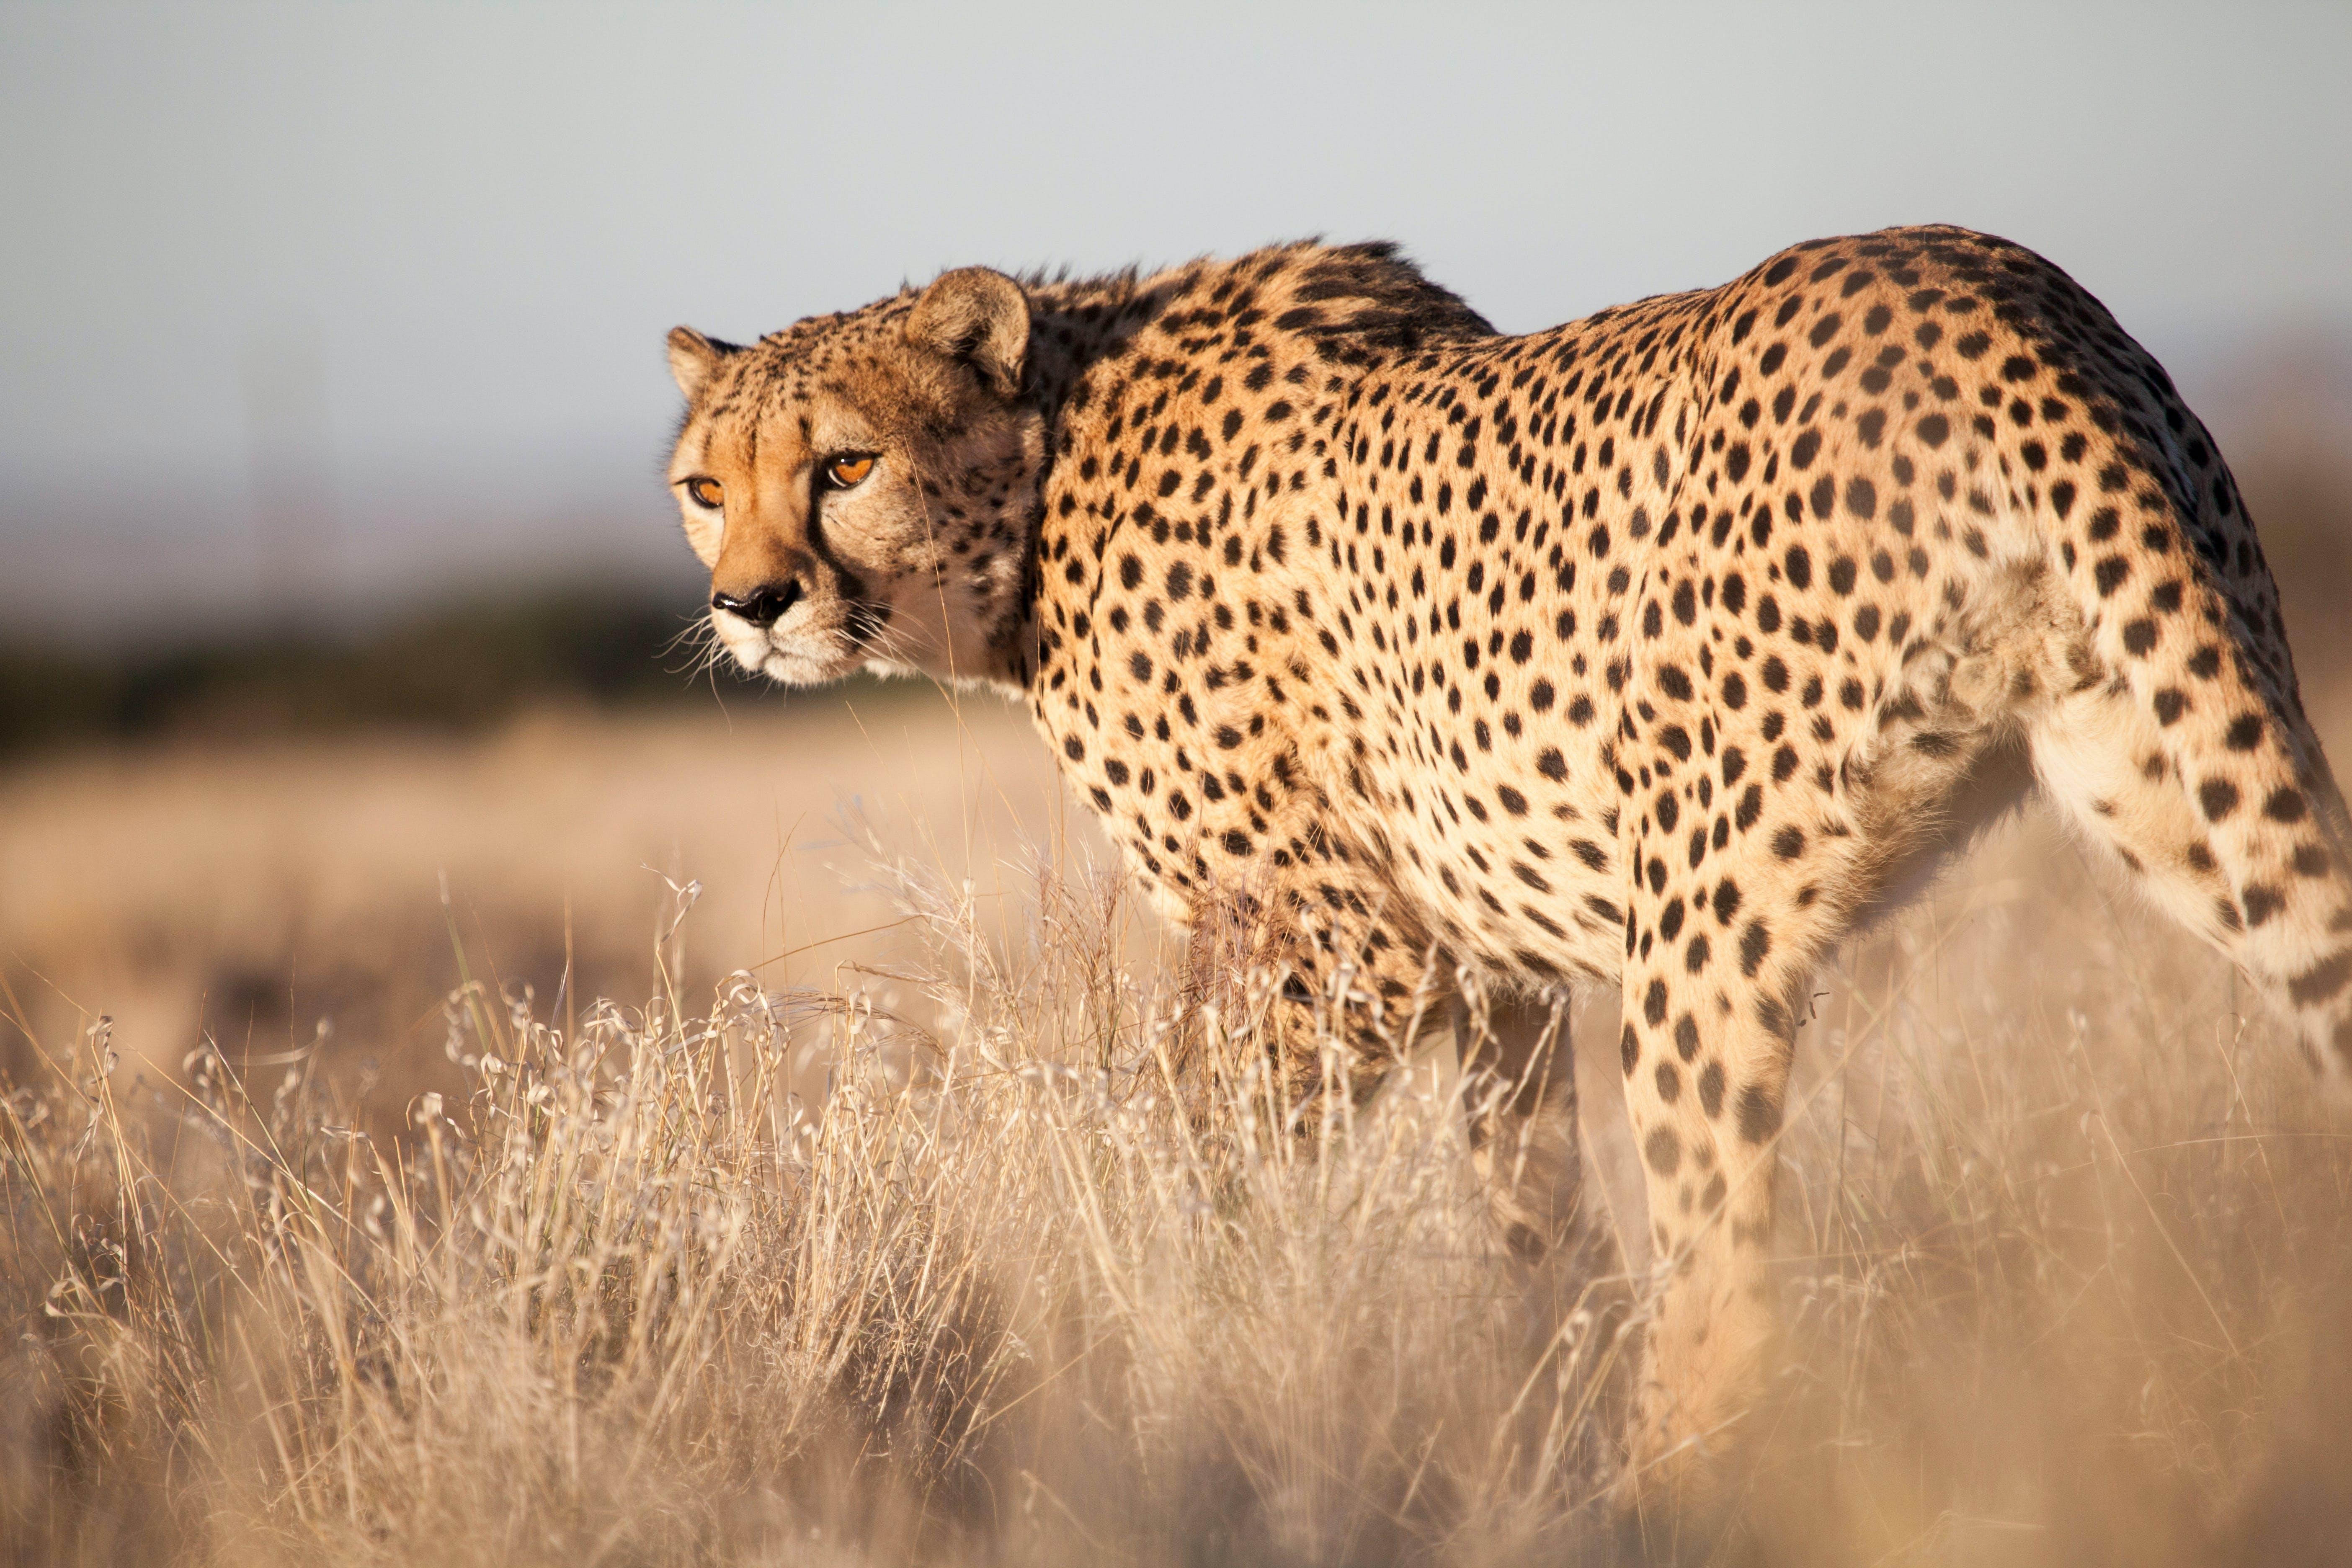 Verdens hurtigste dyr gepard top